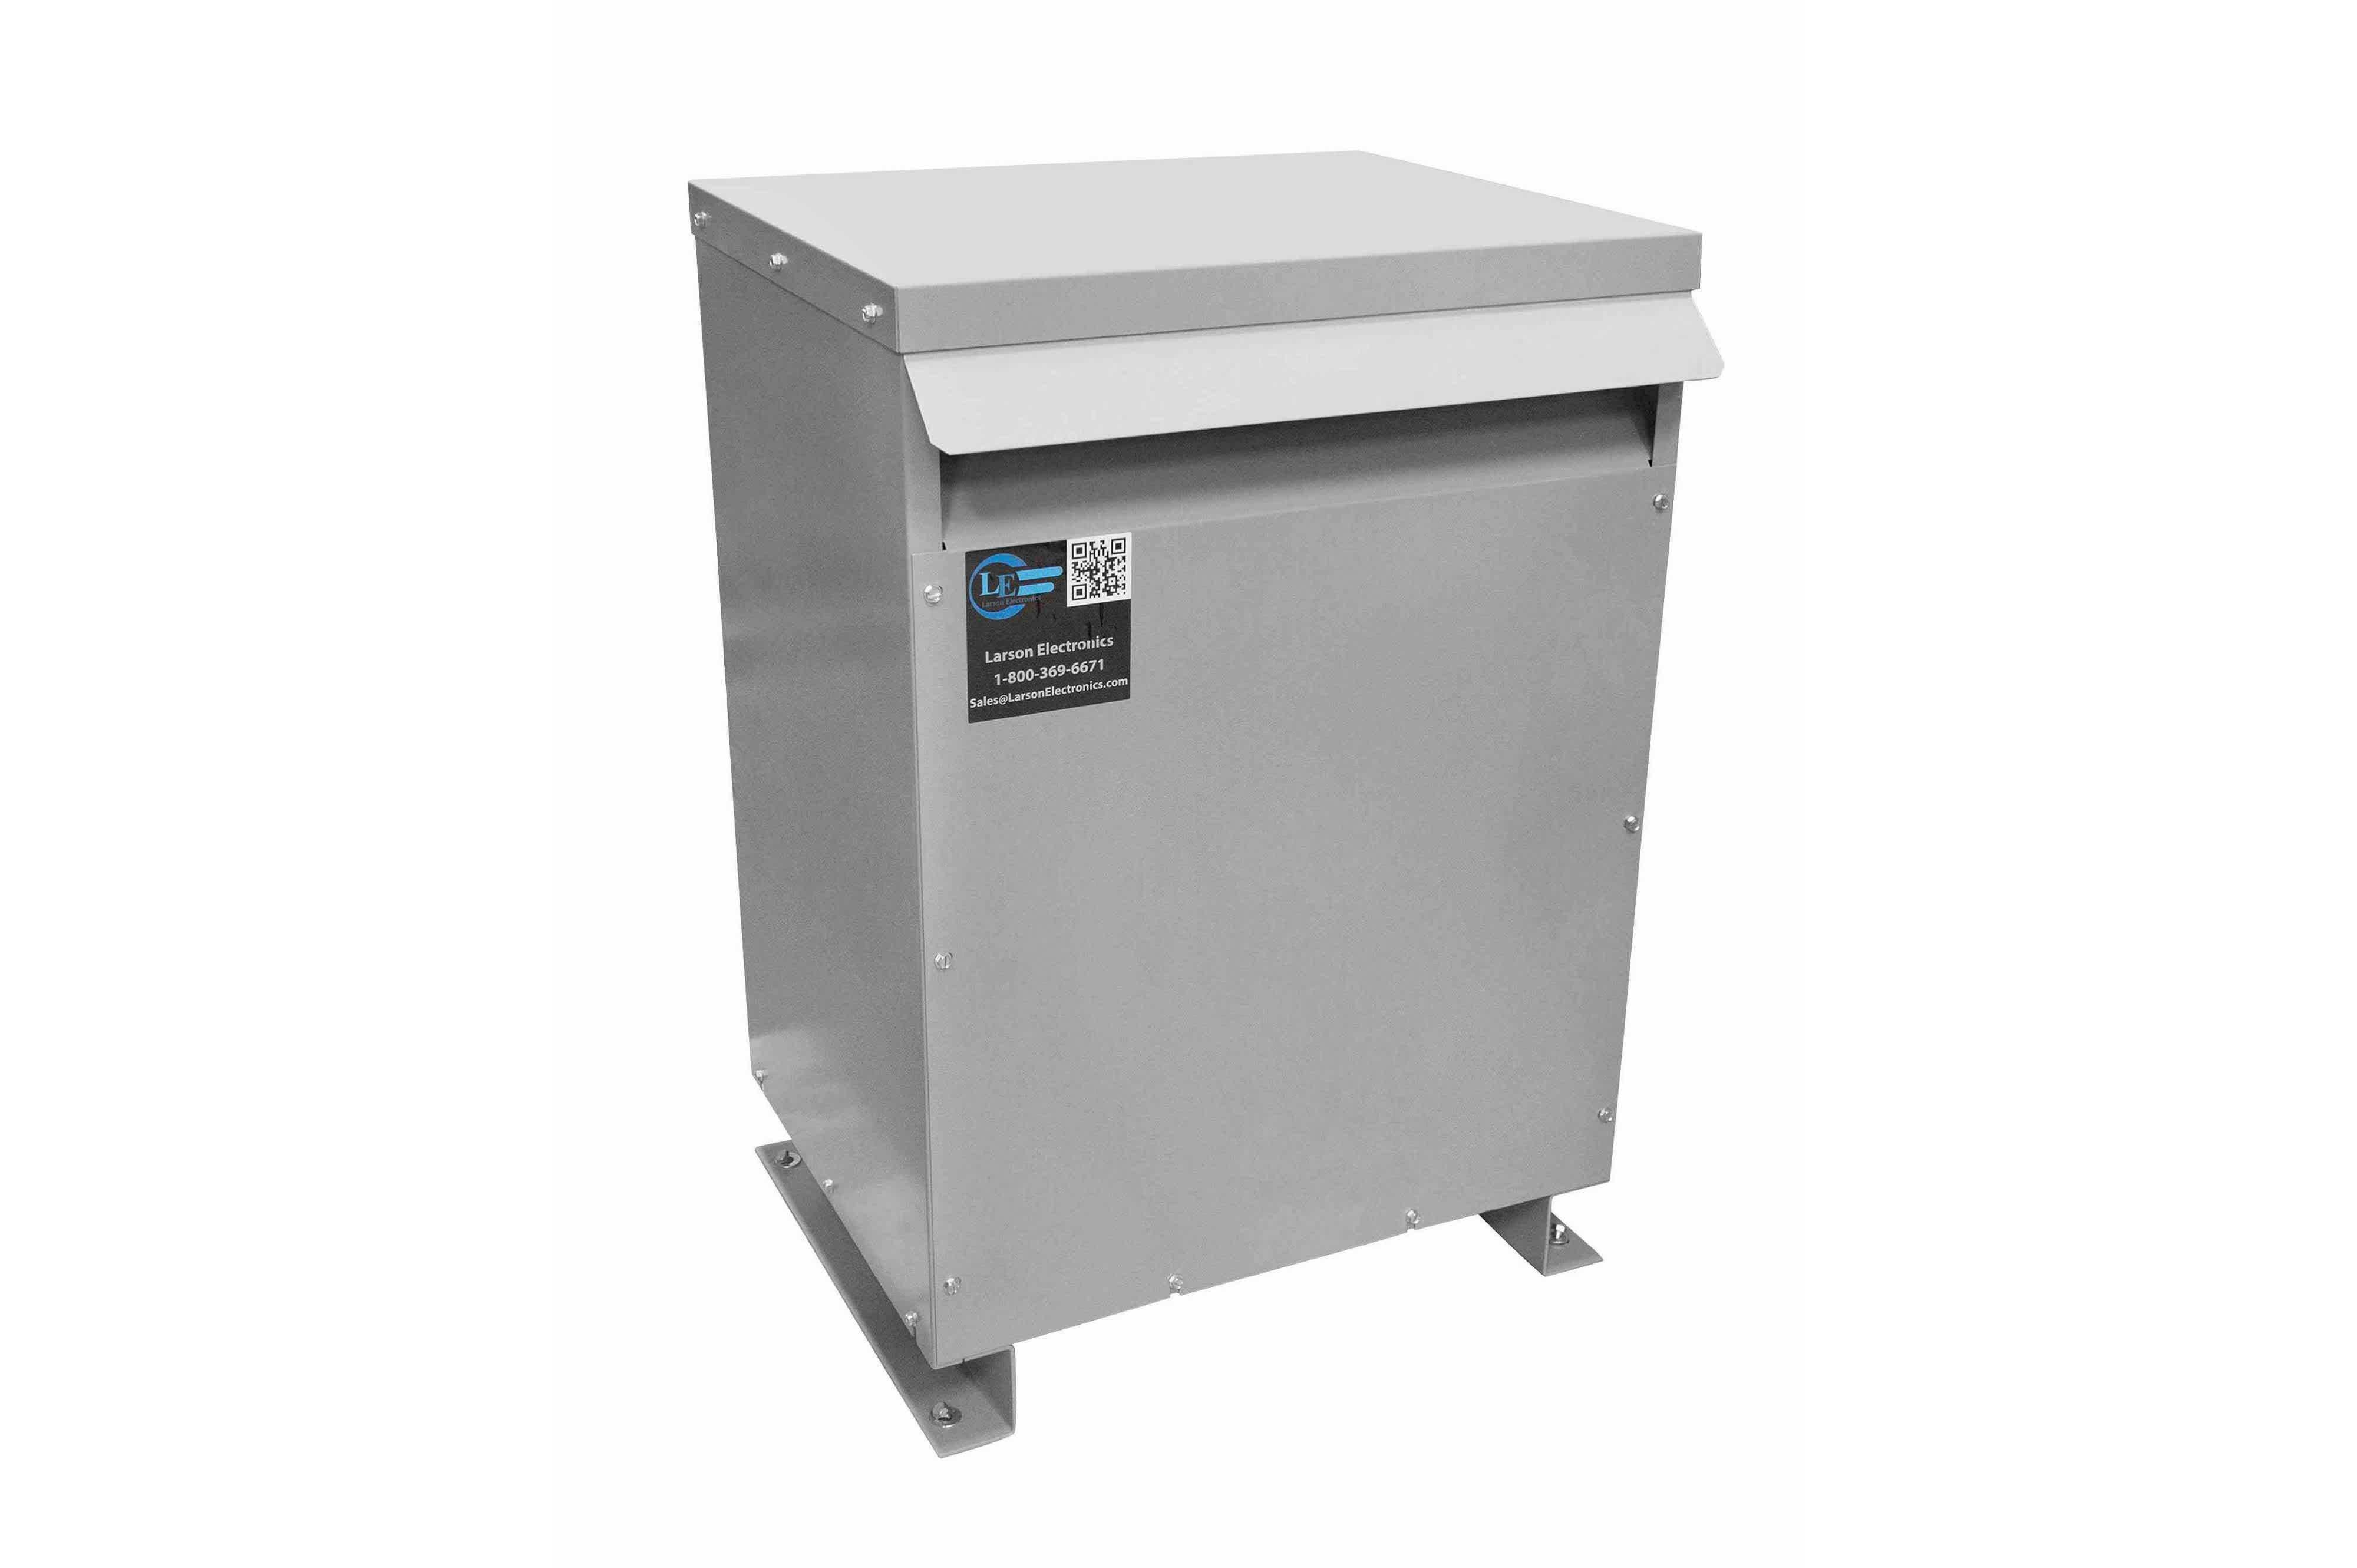 47.5 kVA 3PH Isolation Transformer, 575V Wye Primary, 415V Delta Secondary, N3R, Ventilated, 60 Hz